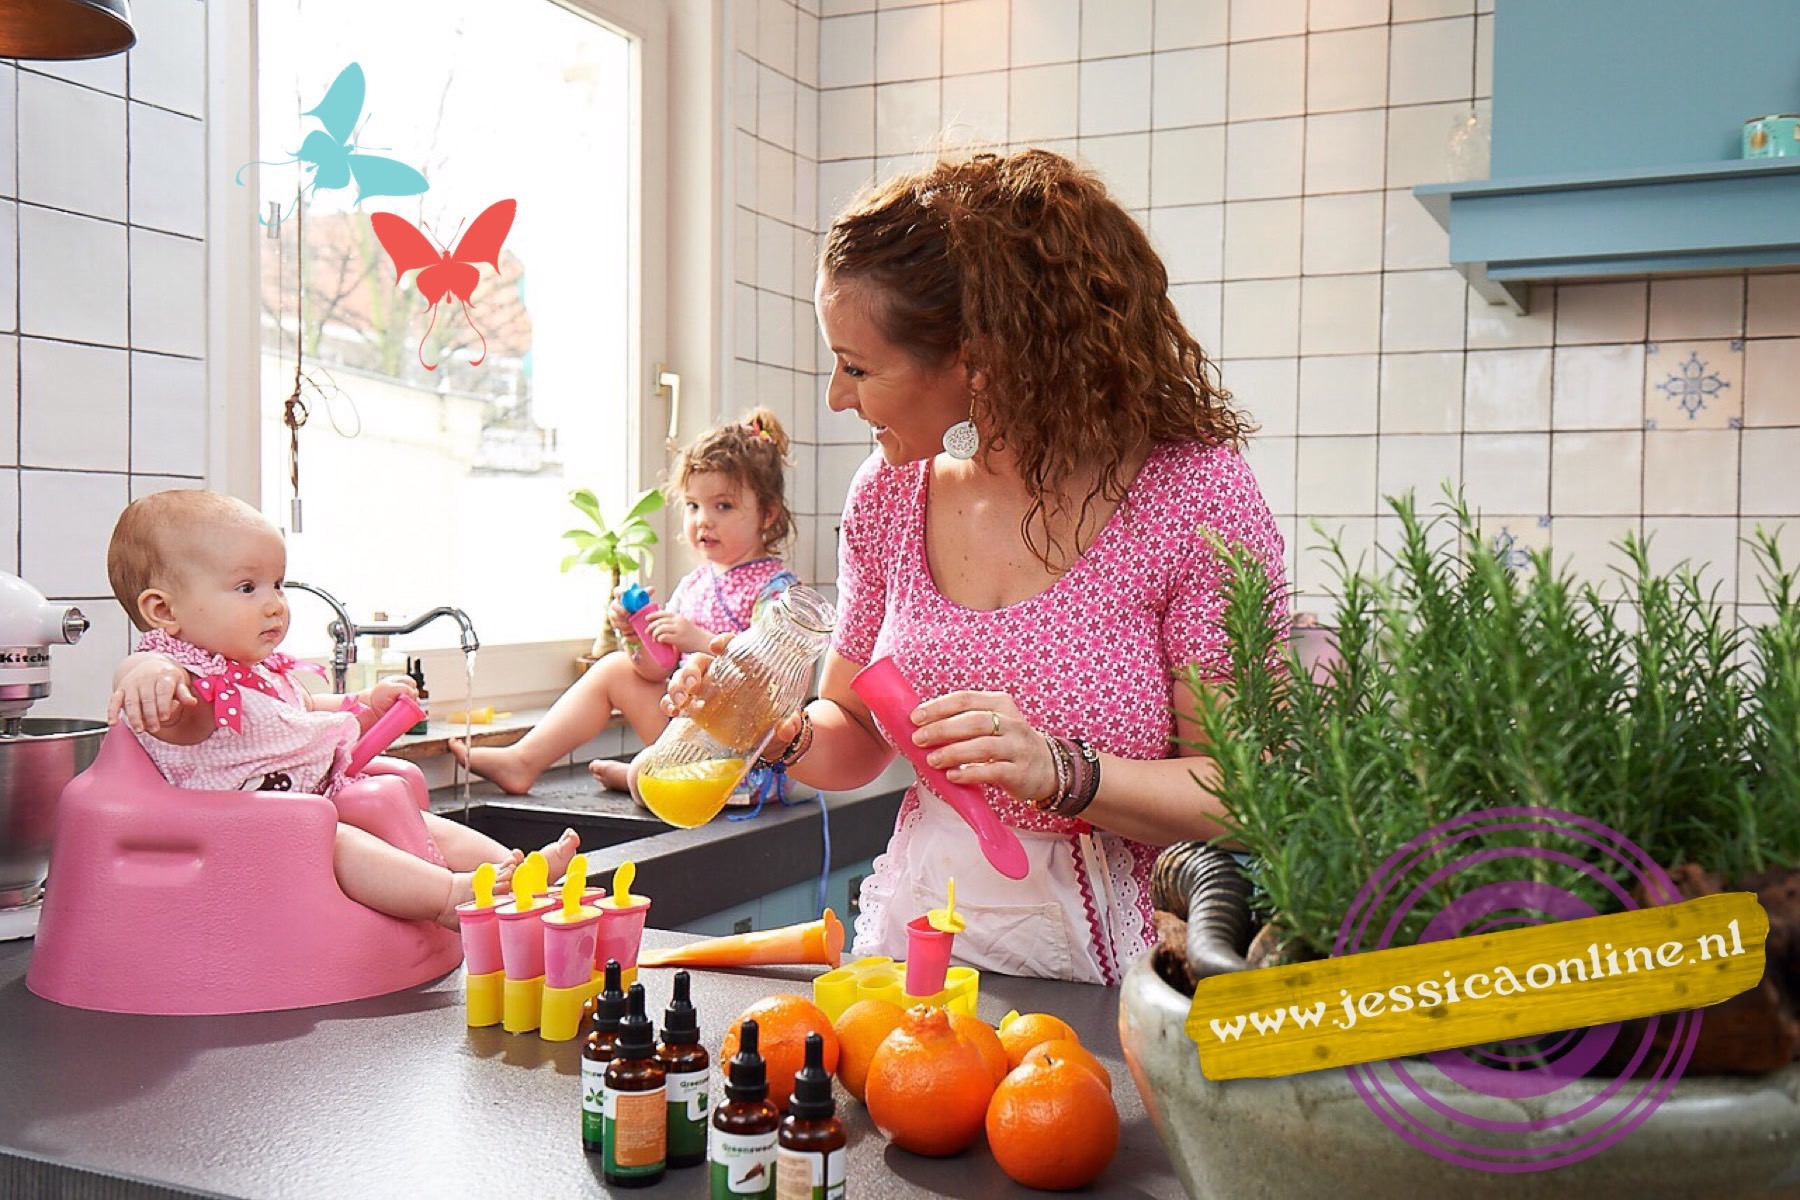 jessicaonline.nl ijsjes maken